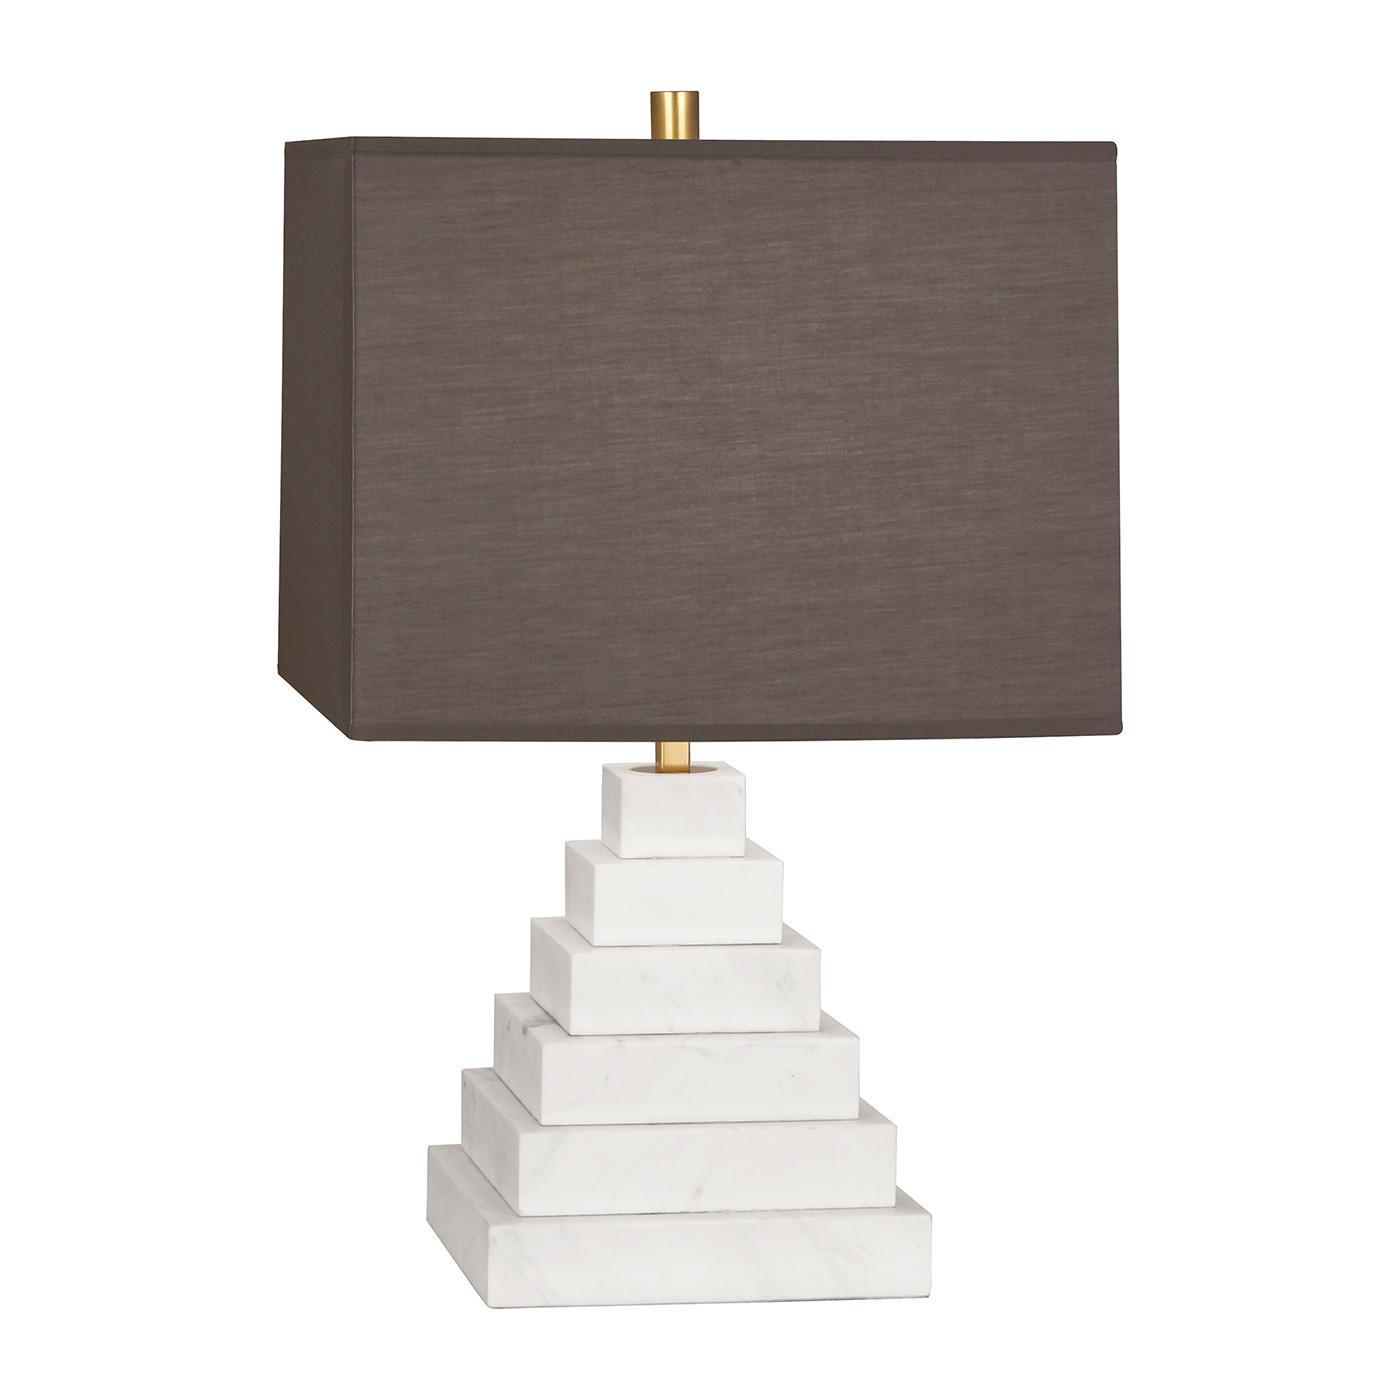 Canaan Pyramid White Marble/Gray Shade Table Lamp